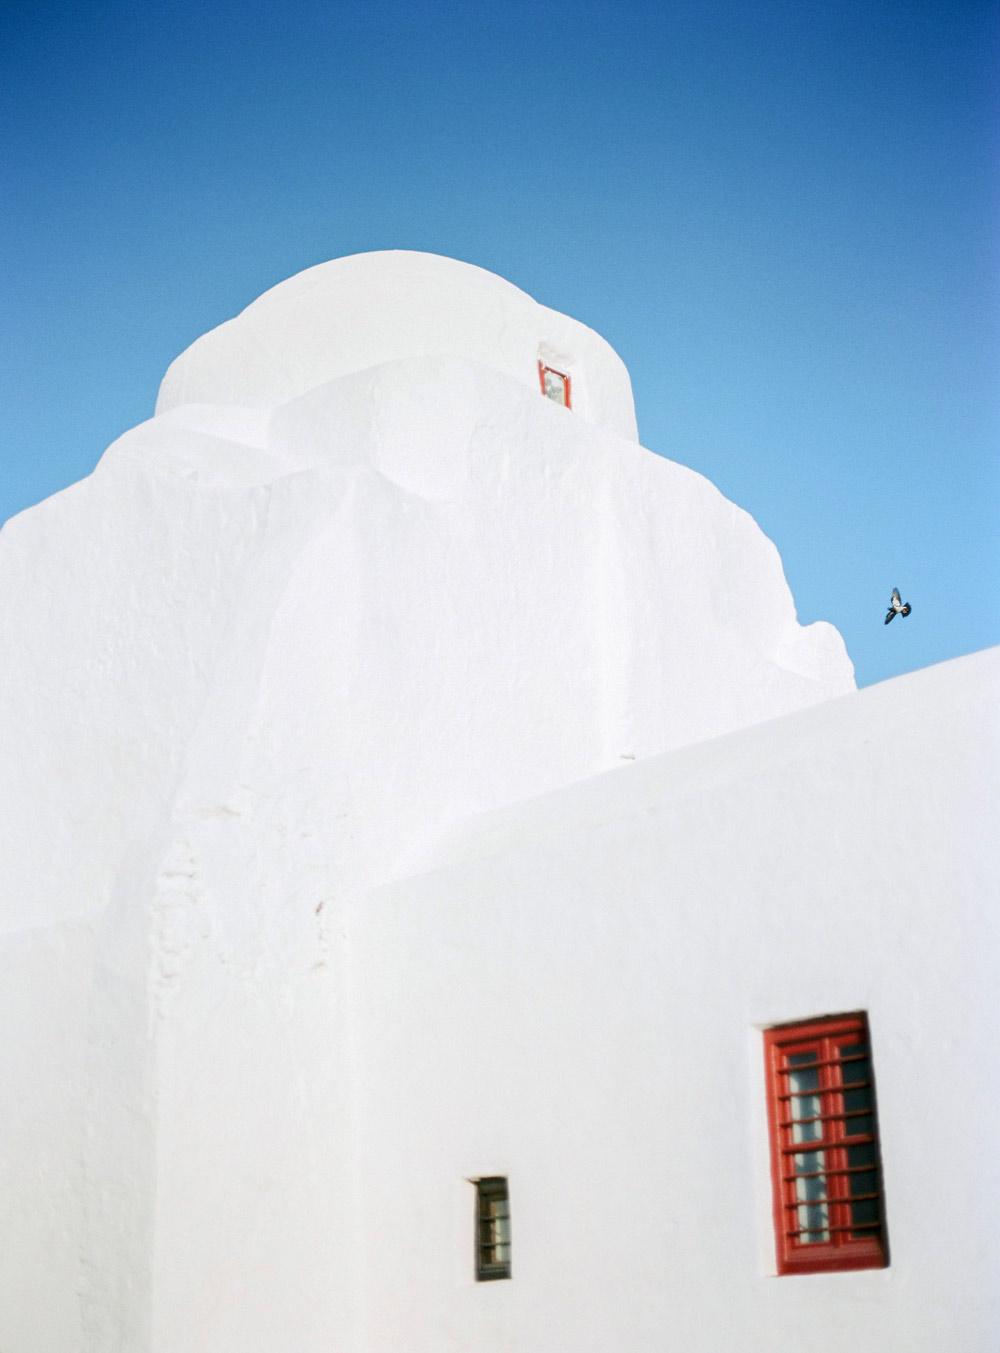 Blanccoco_Photographe_Greece-74